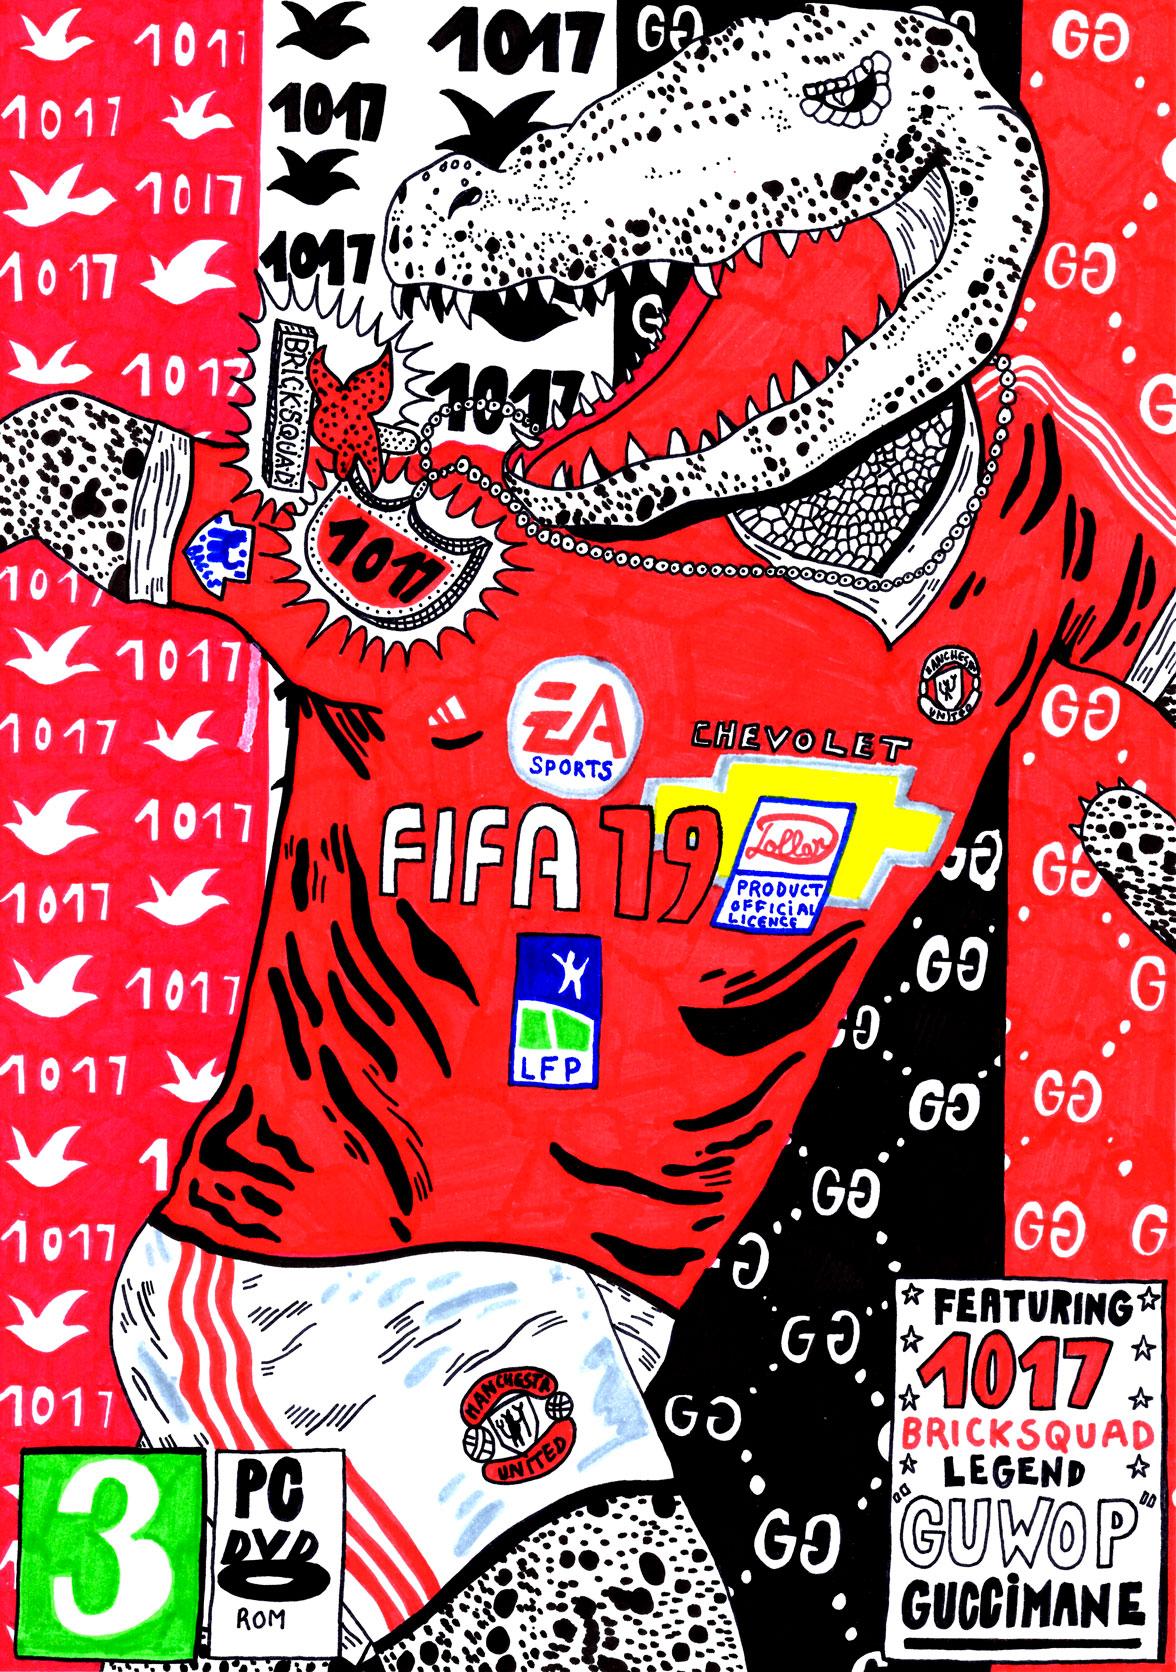 FIFA-19-_-1017-BRICKSQUAD-